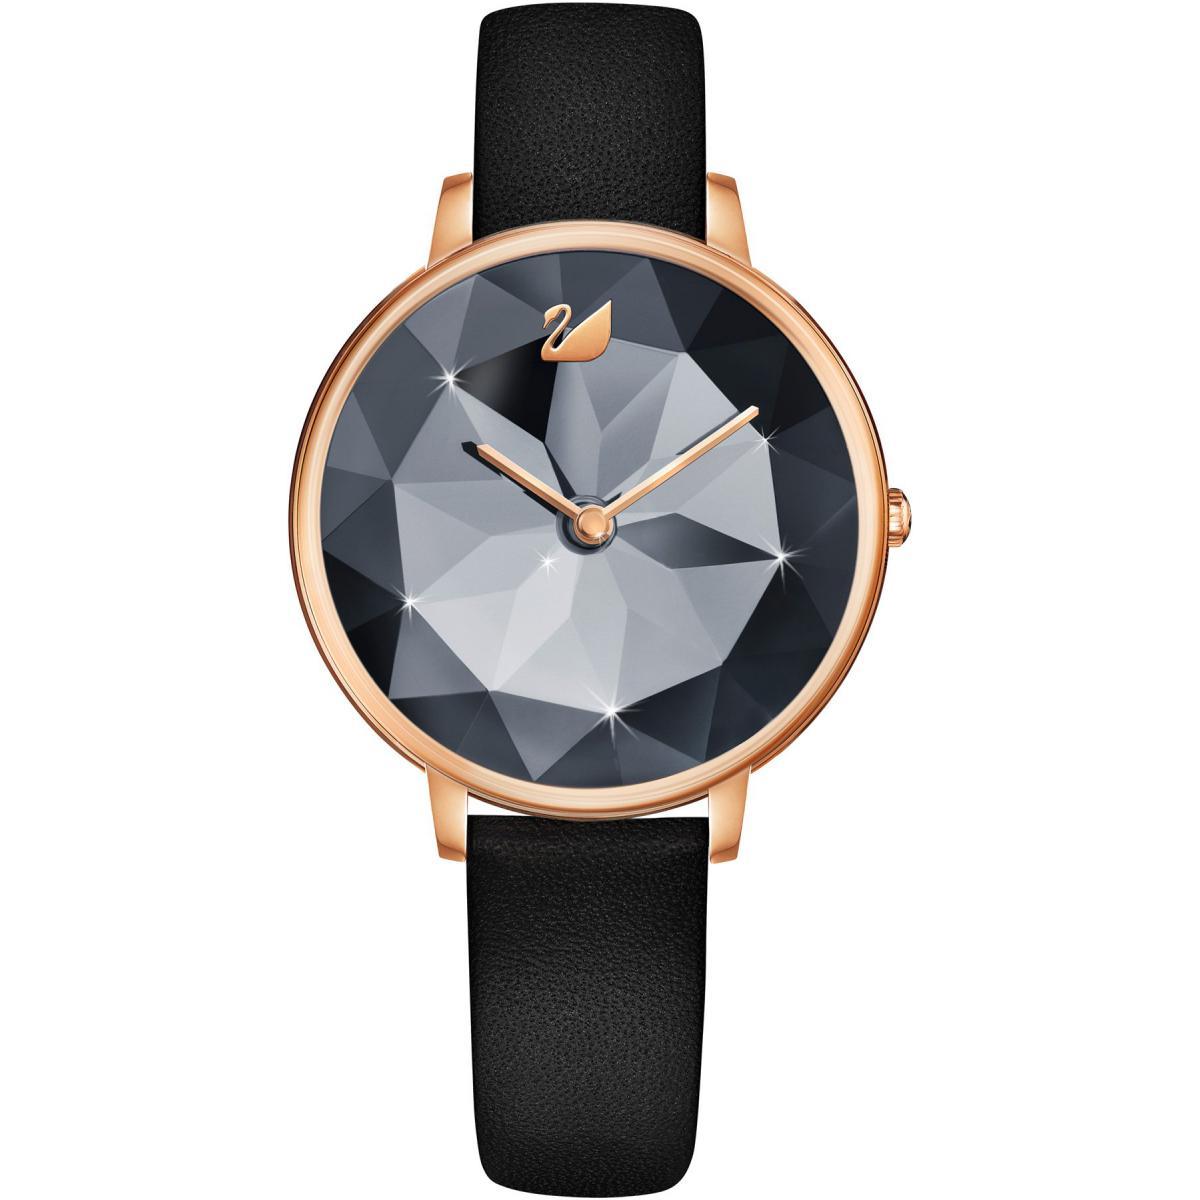 Montre Swarovski 5416009 - CRYSTAL LAKE Bracelet Cuir Noir Boitier Acier  Doré Rose Cadran Noir Femme